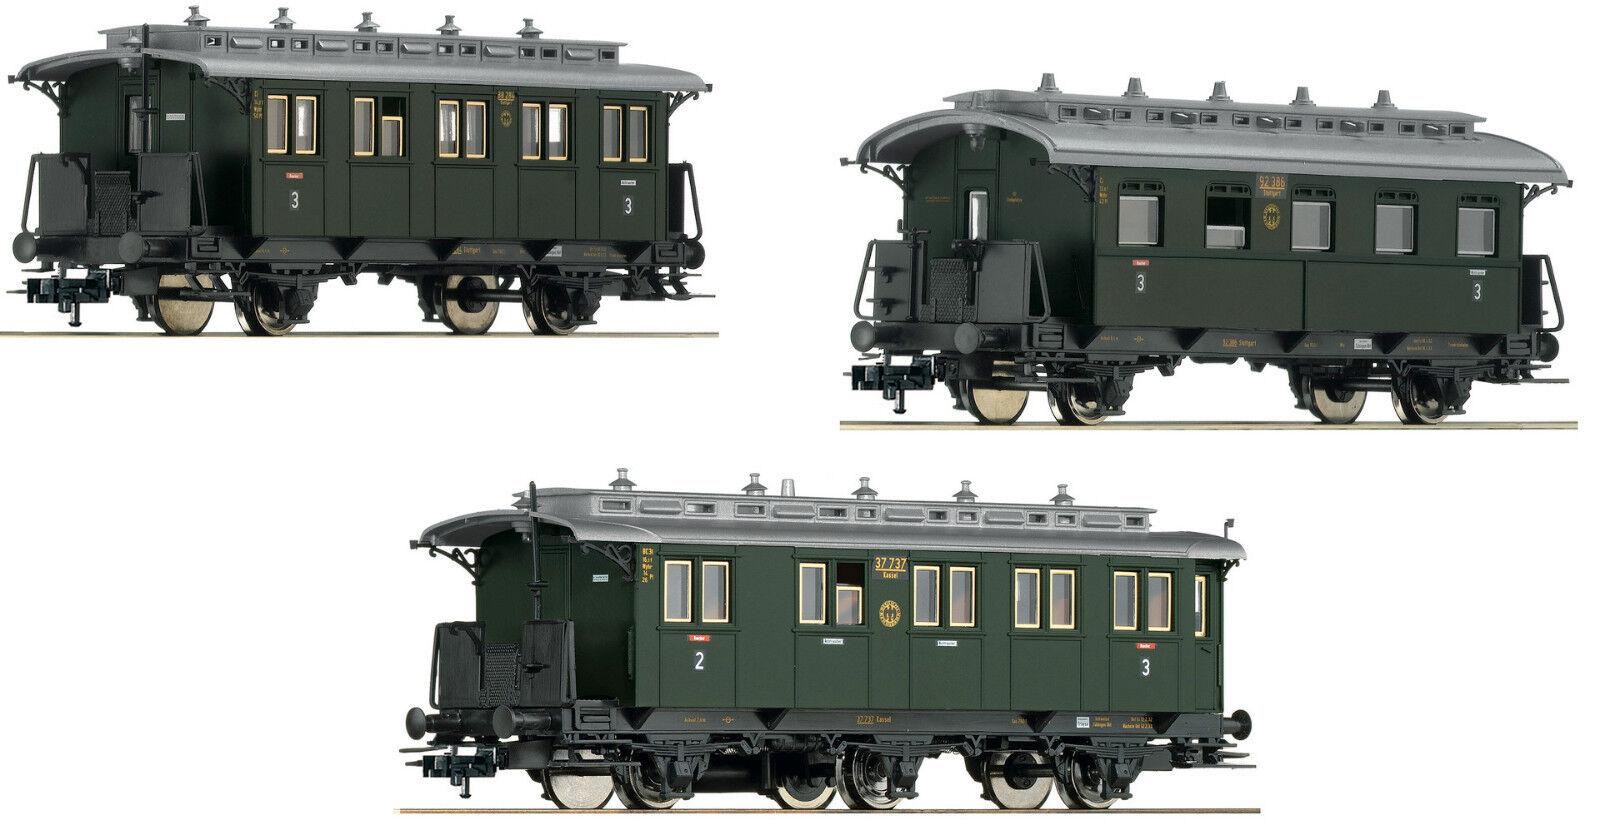 Fleischuomon h0 h0 h0 481804 - 3 Pezzi Set  accanto a Bahn-treno  (parte 1), DRG Merce Nuova 7d40f3